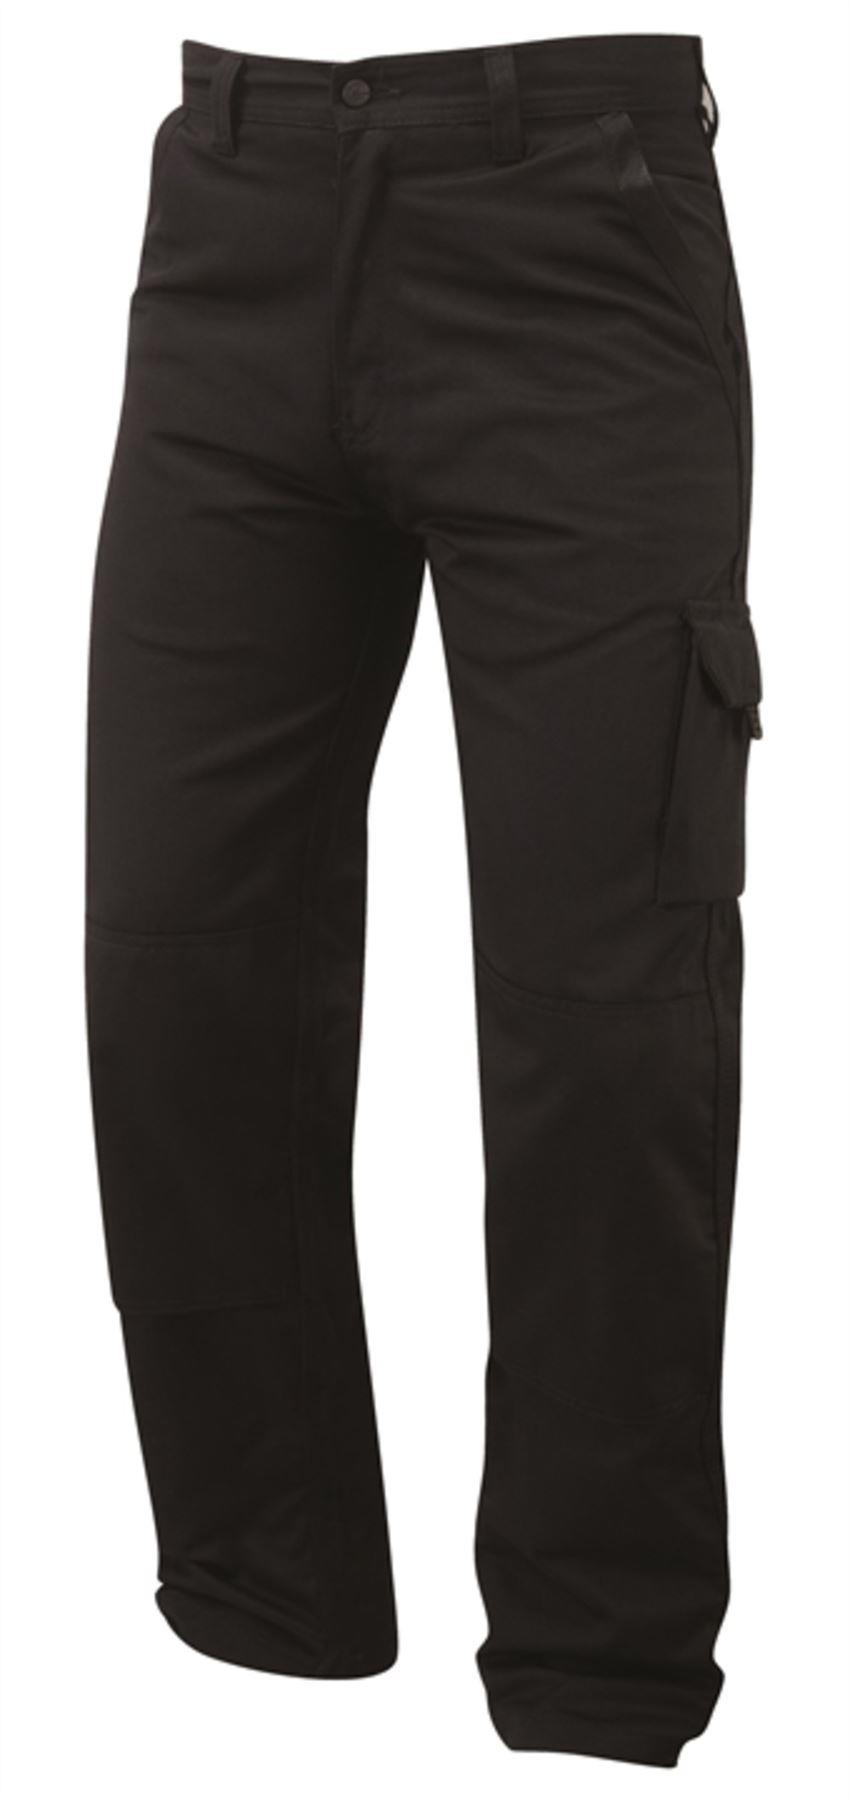 Orn Heron Kneepad Combat Trousers - Black|44W29L